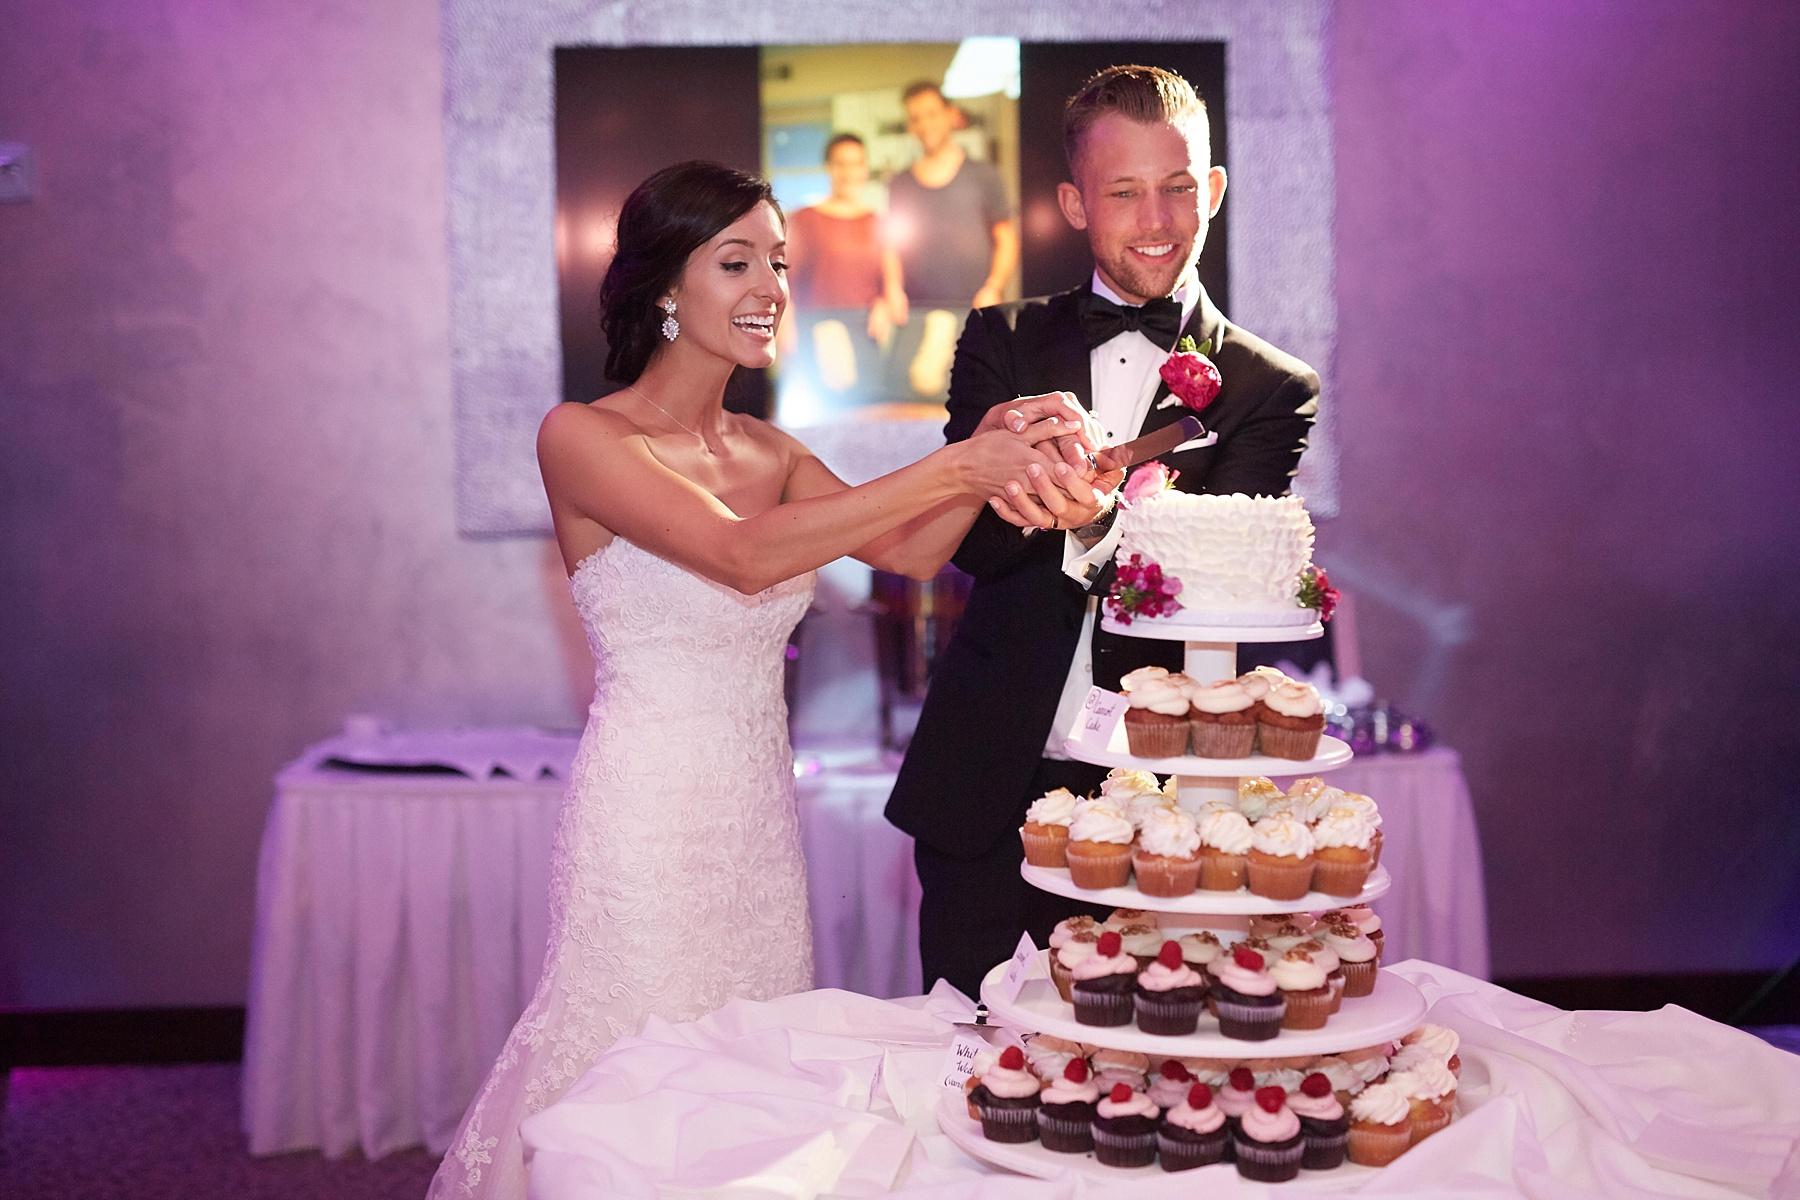 ABULAE-Wedding-Saint-paul-MN-Josh-Sofia-Wedding-Mears-Park_0852.jpg